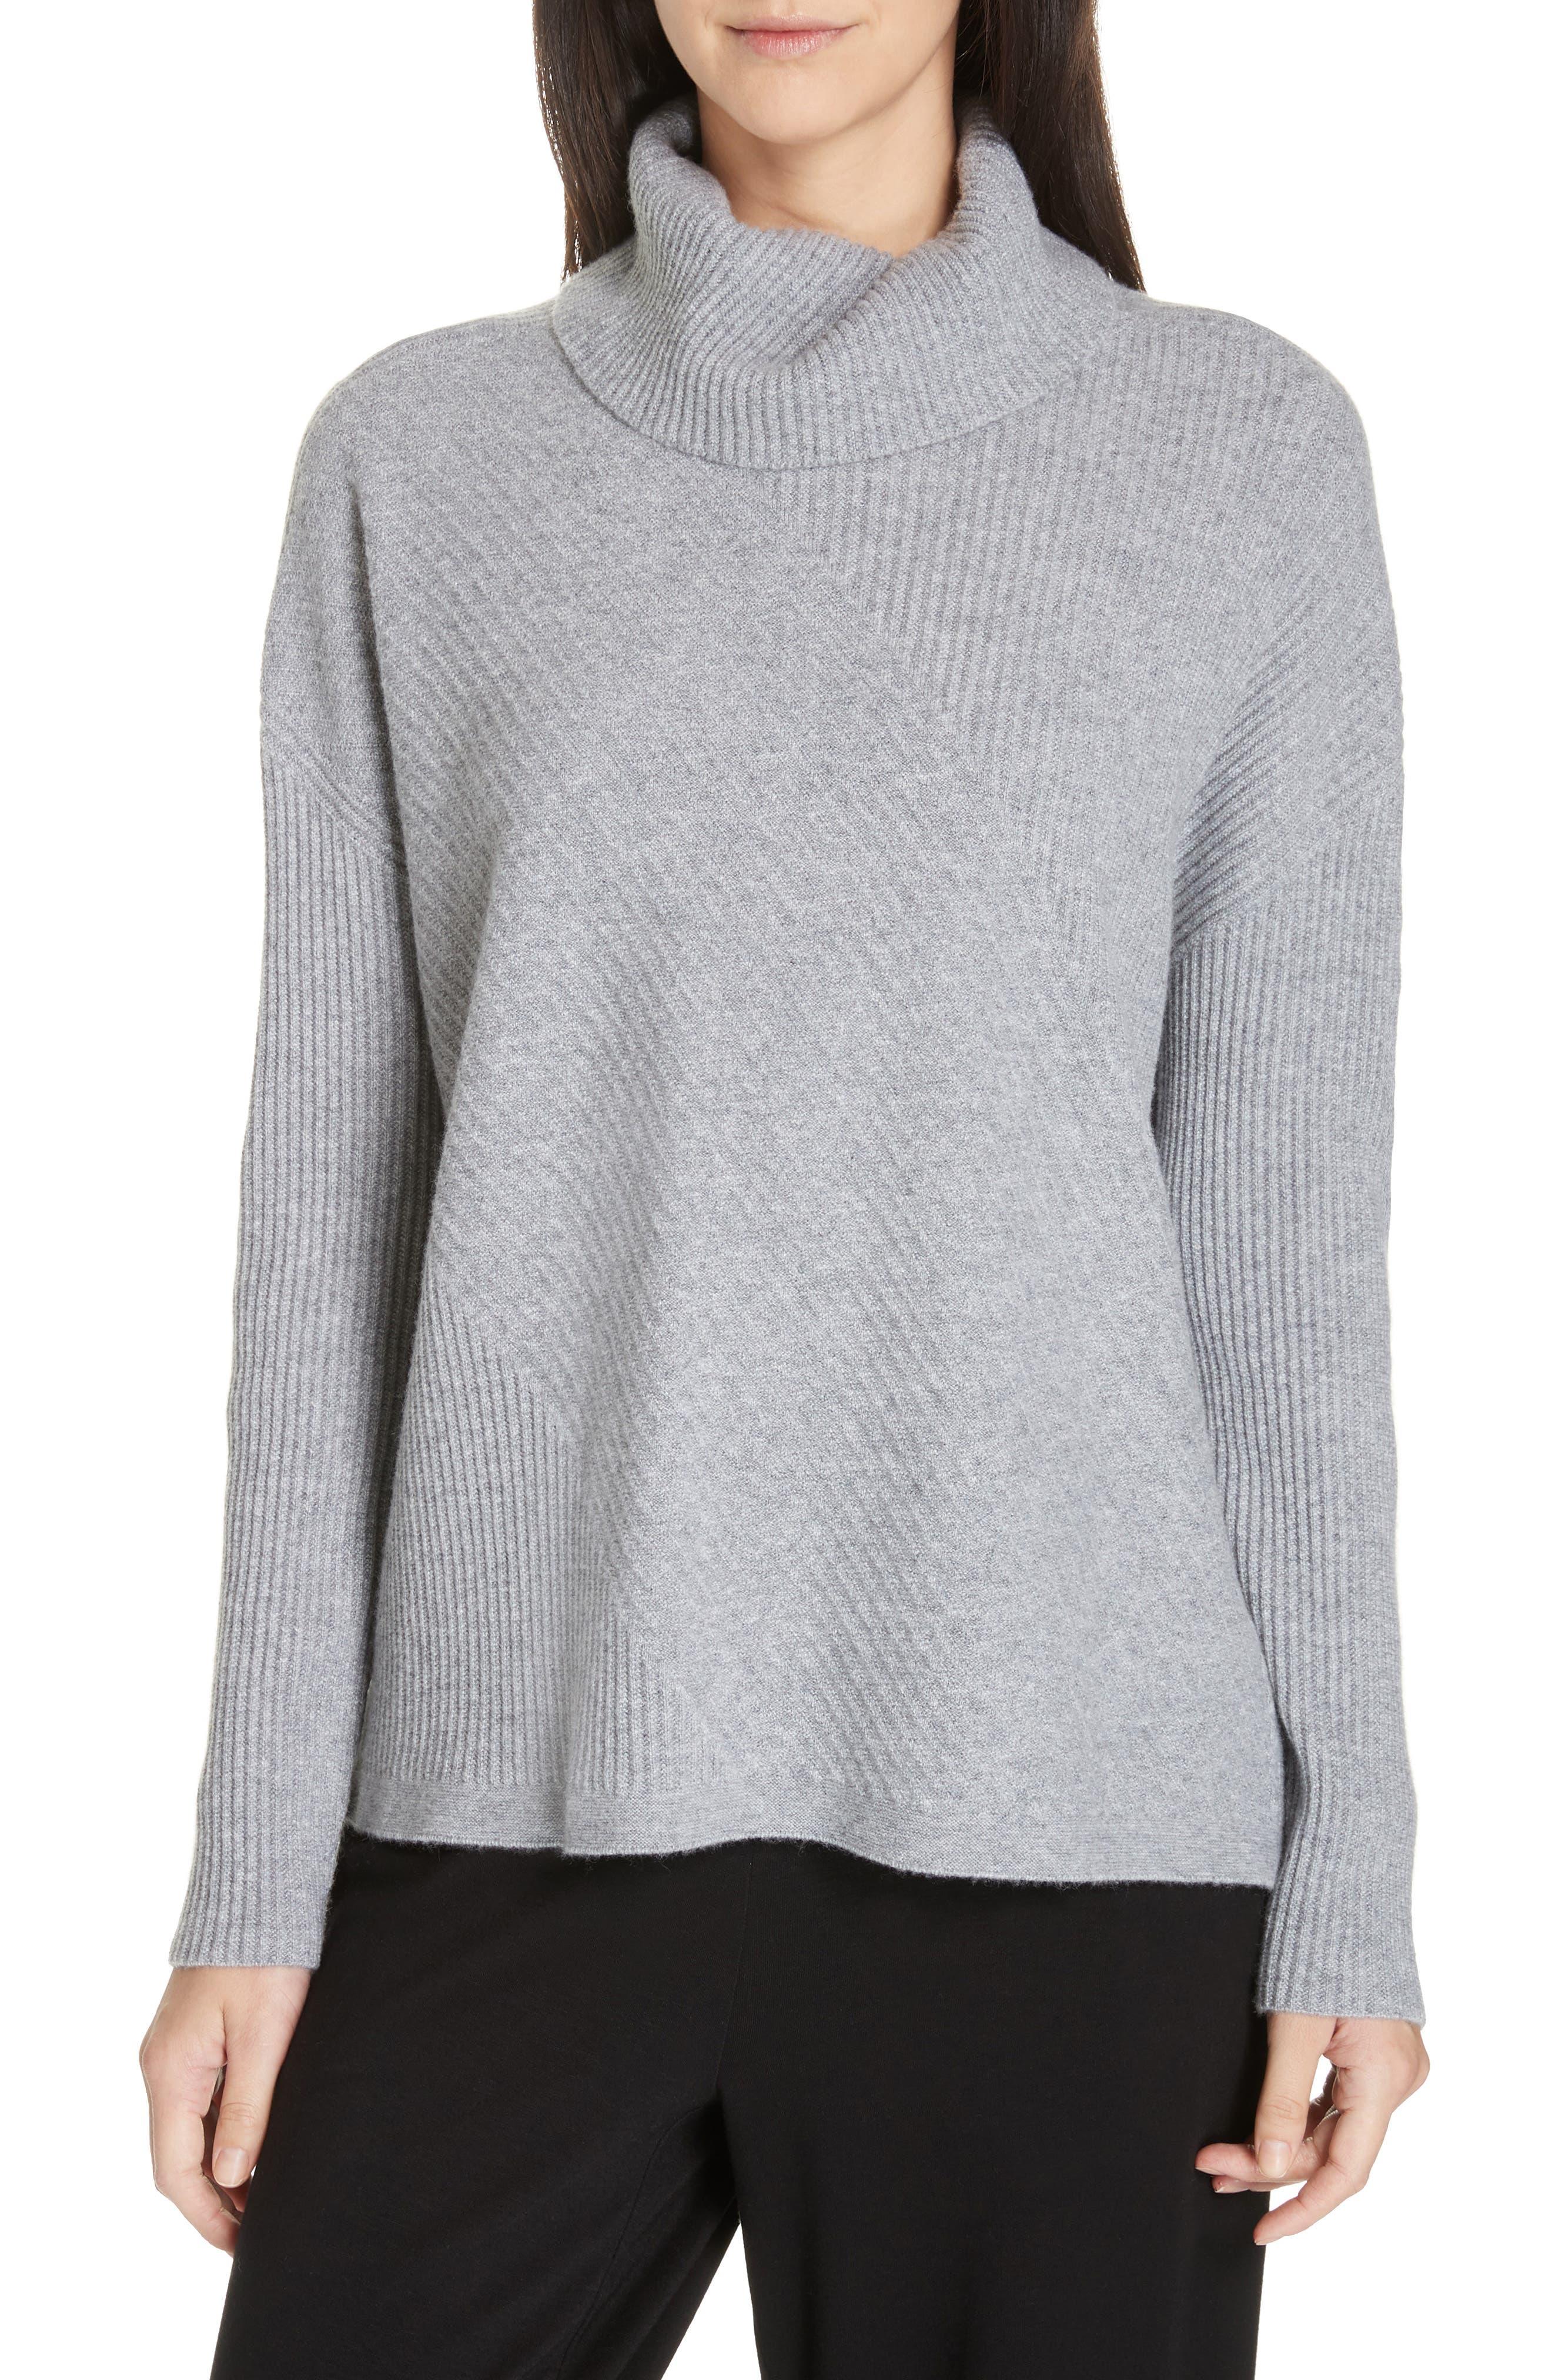 women's eileen fisher cashmere turtleneck top